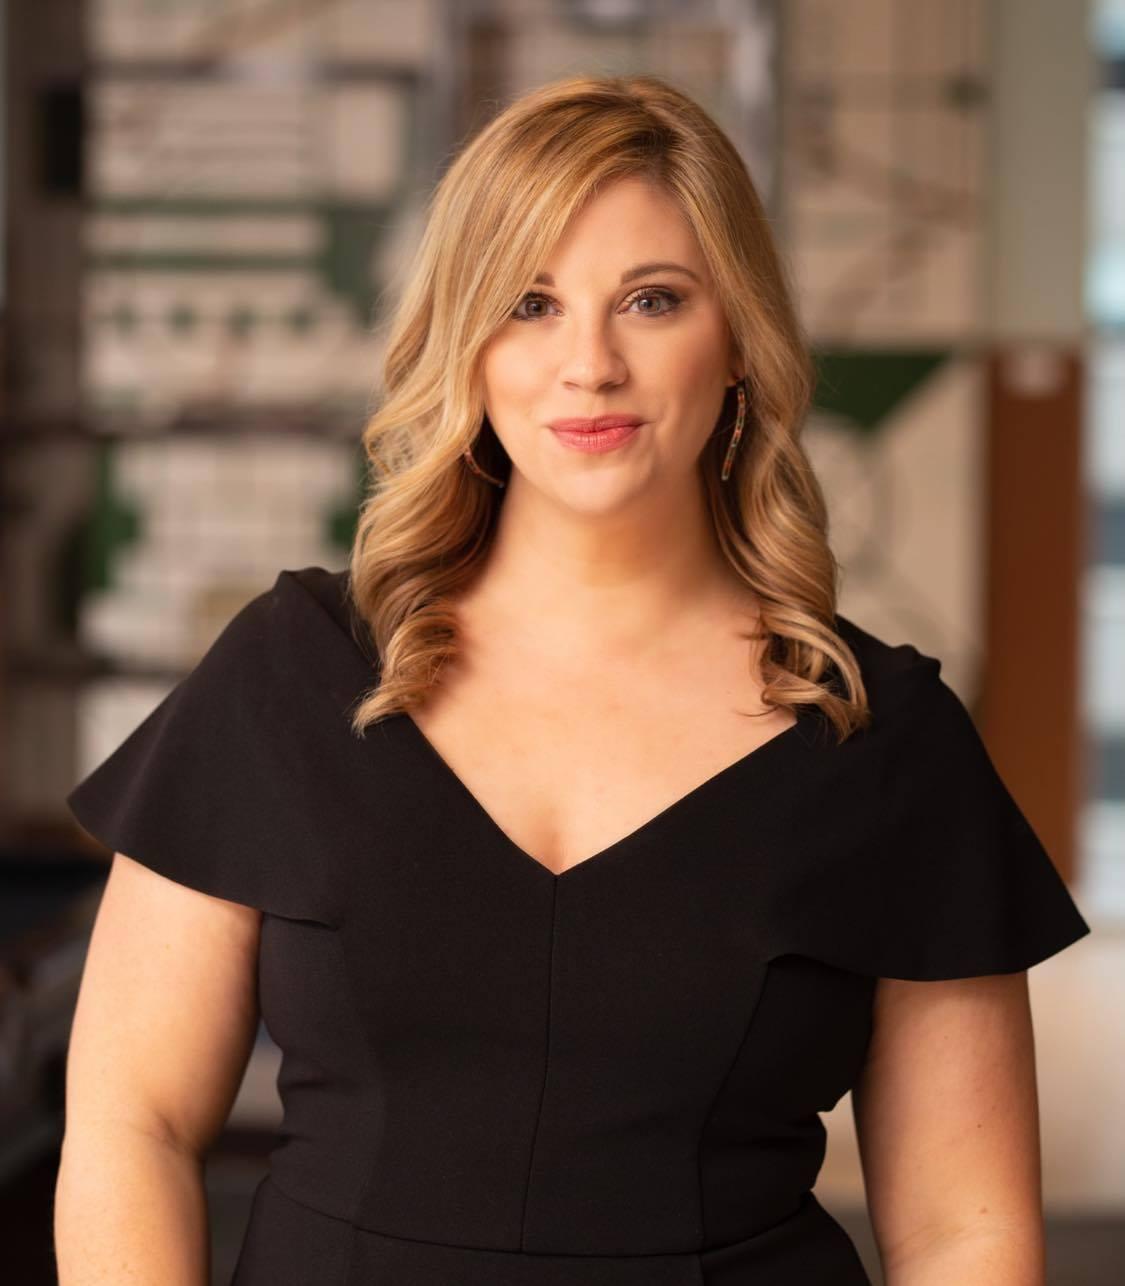 Stephanie undefined Kelley